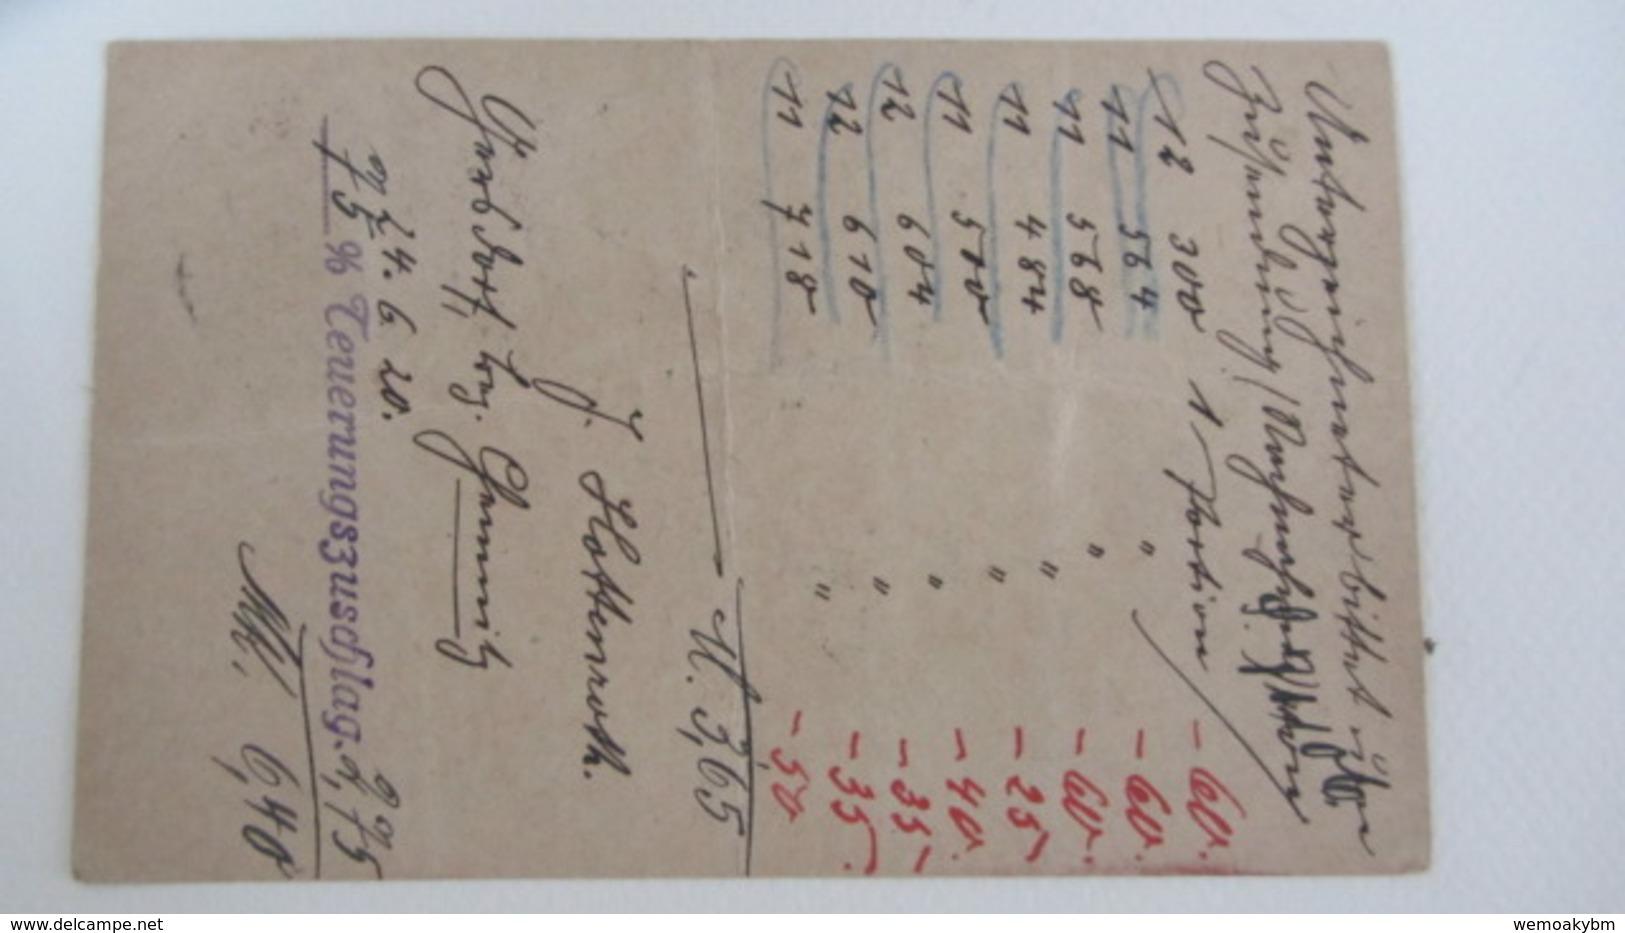 DR: GA Postkarte Mit 15 Pf Germania Und Zusatzfr.15 Pf Stpl. GERSDORF(BZ. CHEMNITZ) Nach Erfurt 24.6.20 Knr: P116 I Ua. - Briefe U. Dokumente